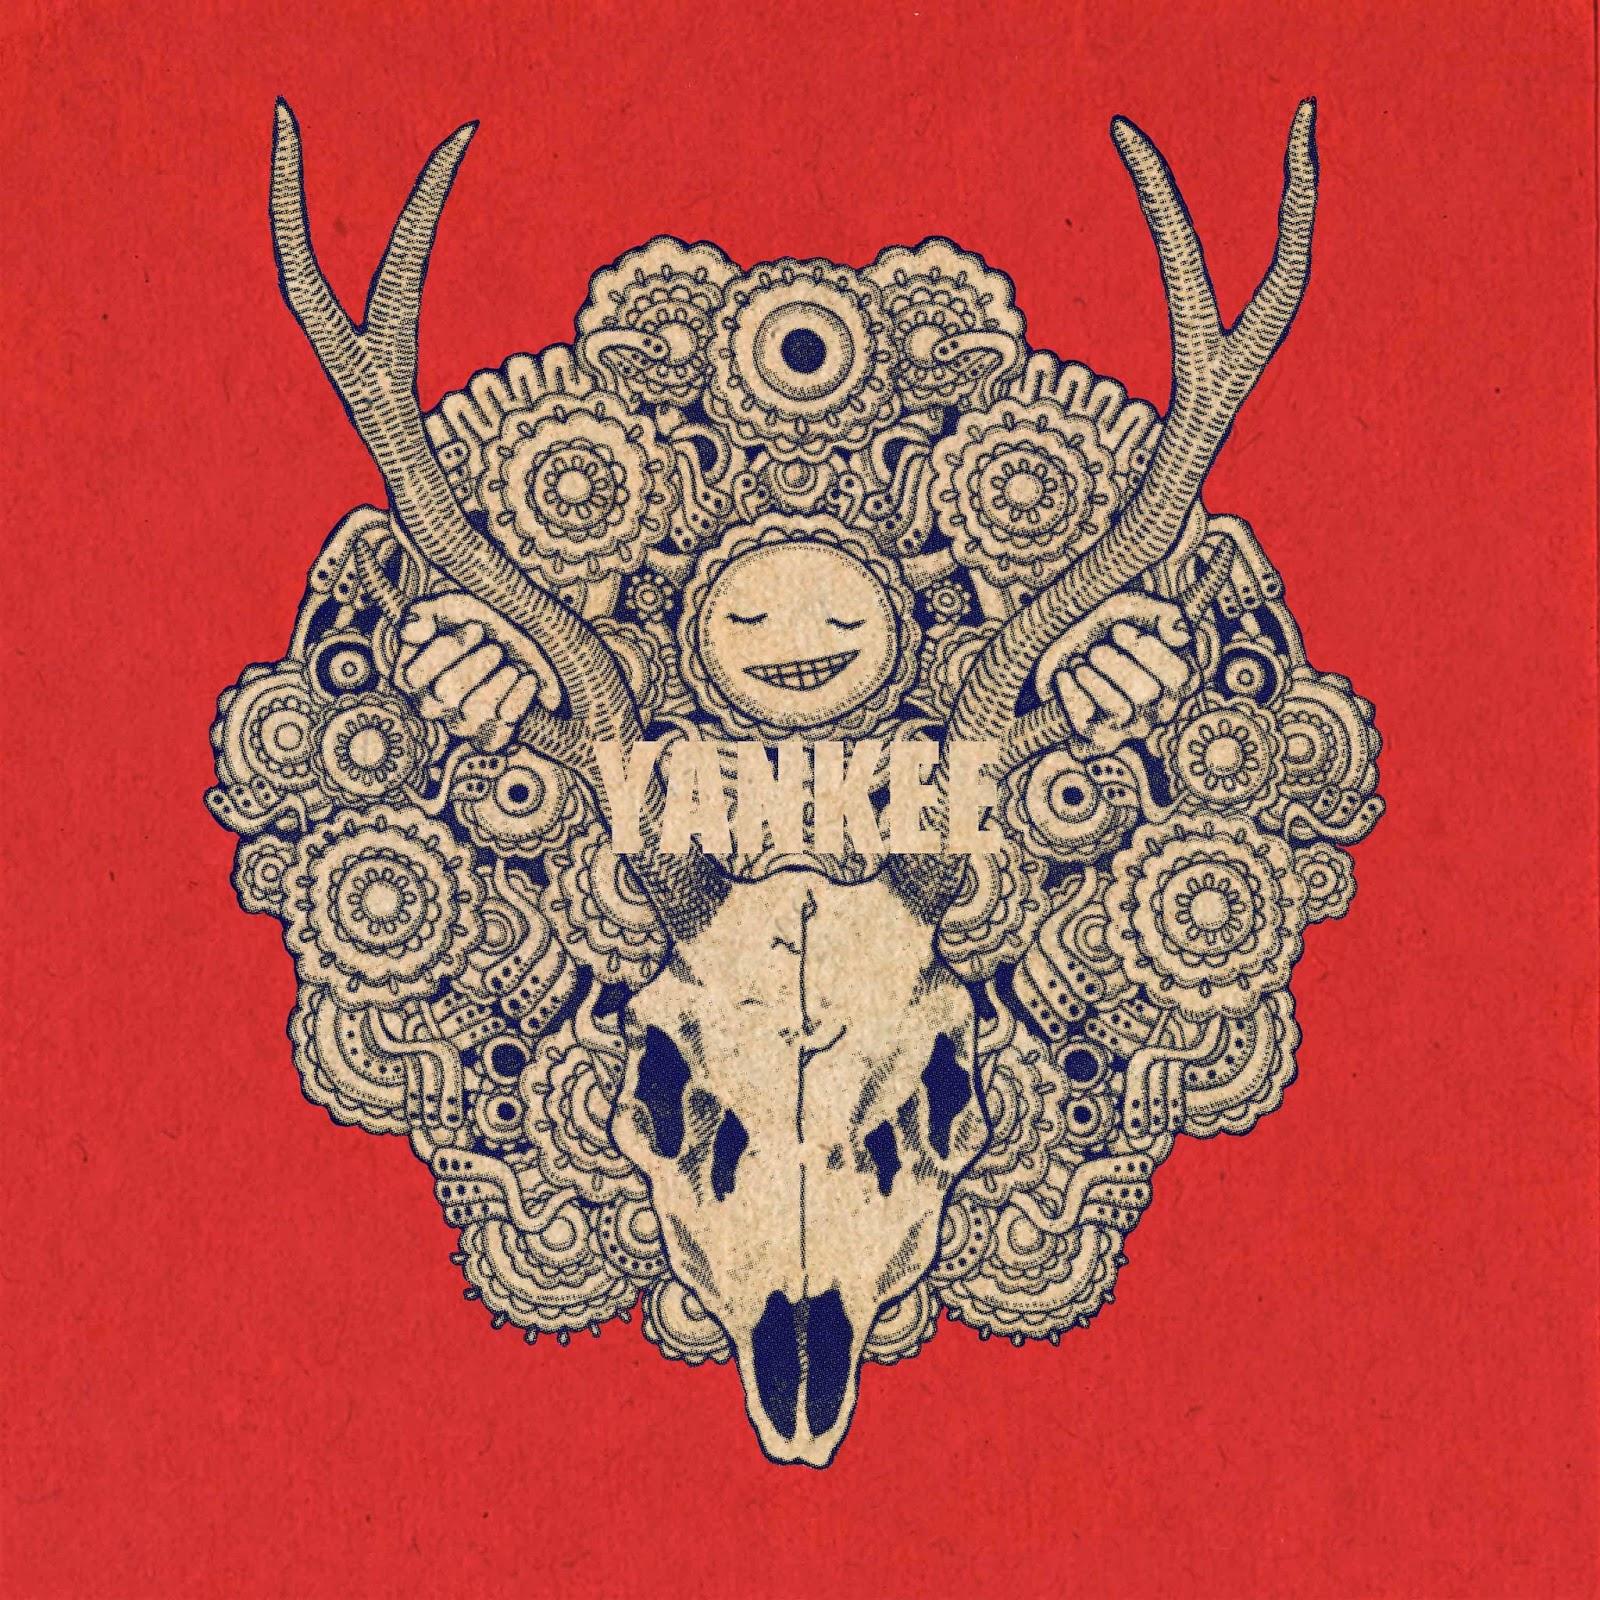 YANKEE , 米津玄師 (CD. Ver)